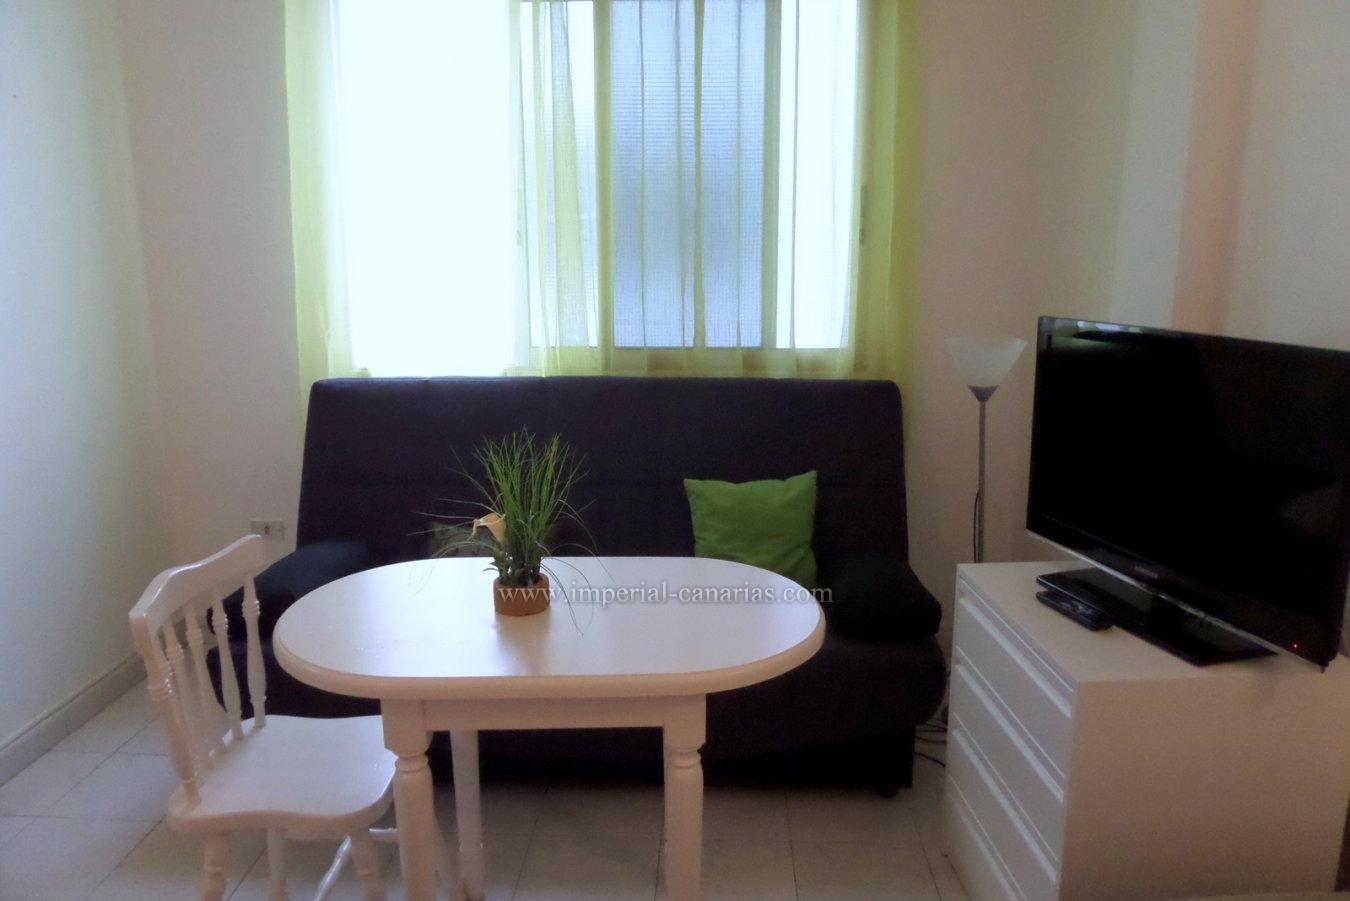 Comfortable and equipped studio for rent in the heart of Pto. De La Cruz.